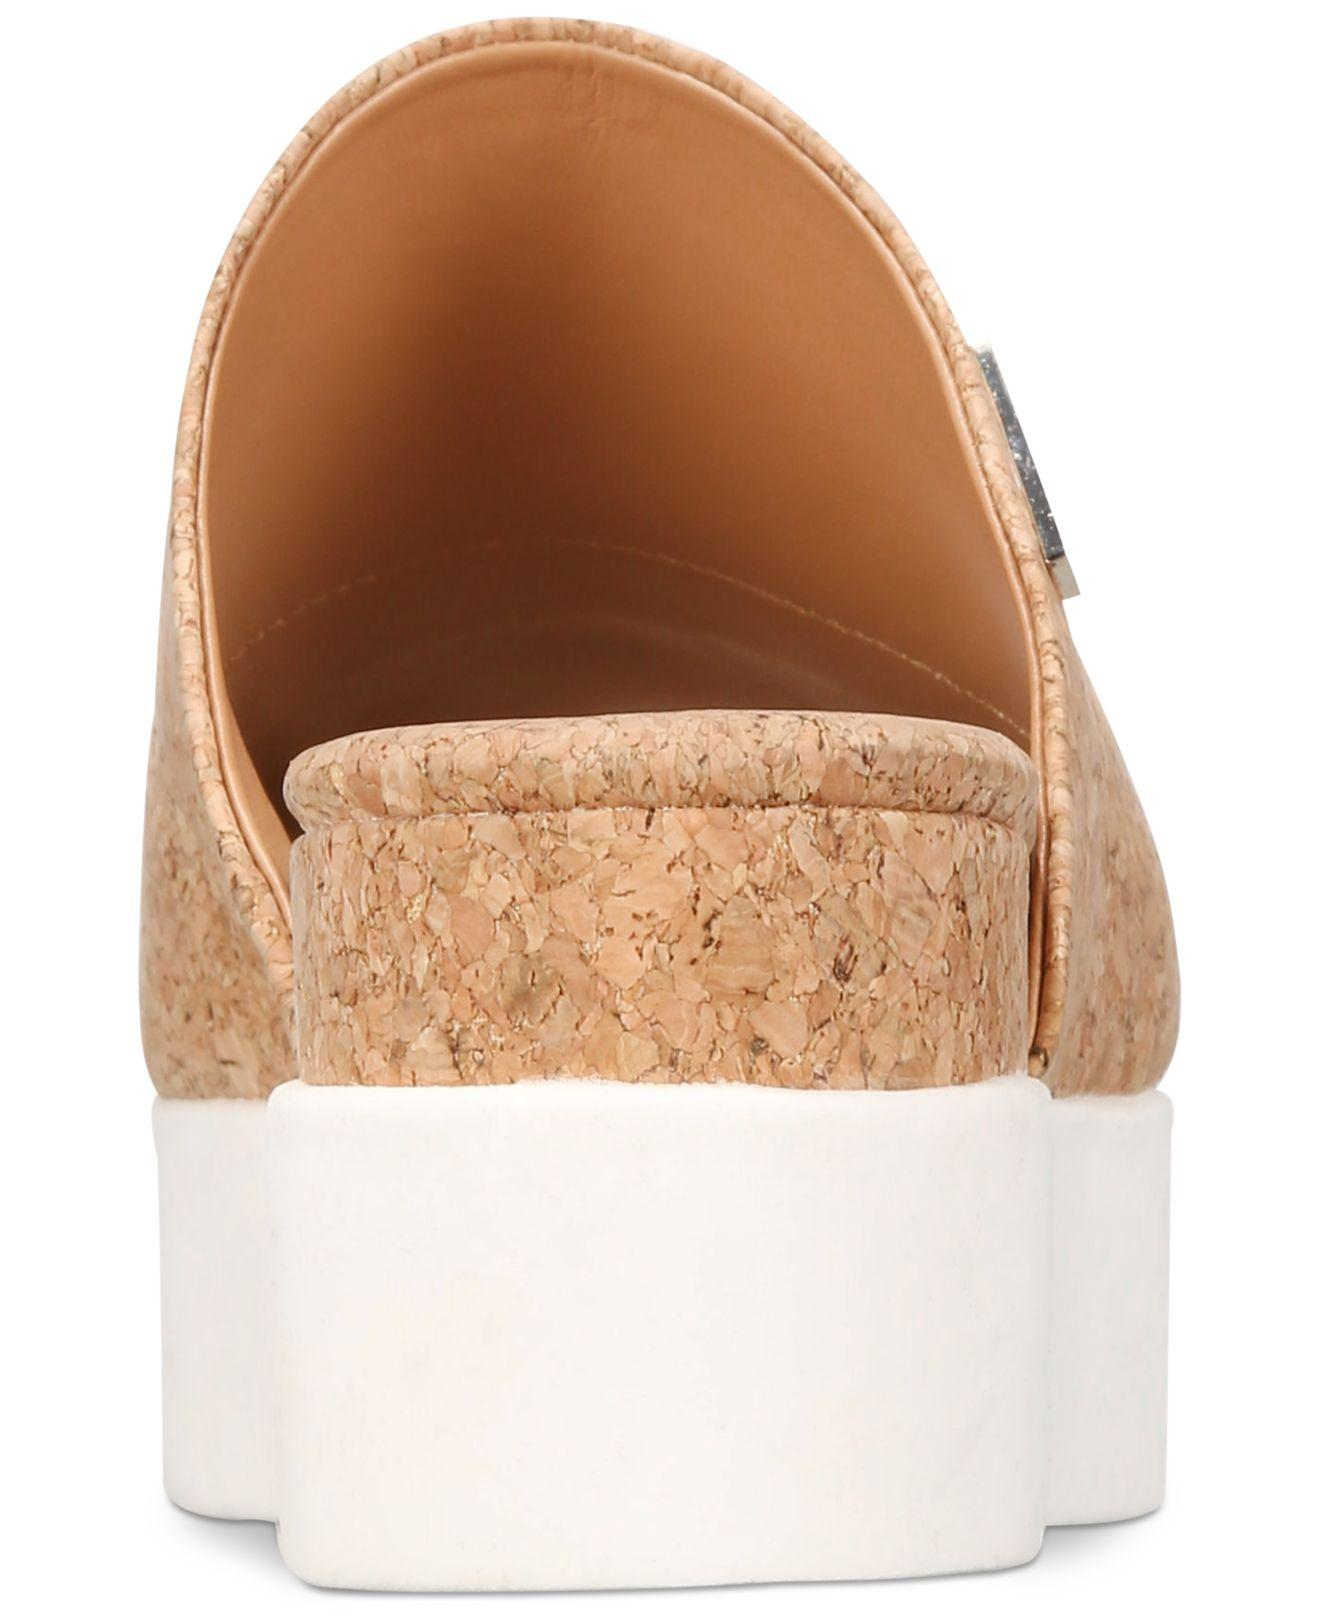 bfc943c5ed5 DKNY - Natural Carli Sandals